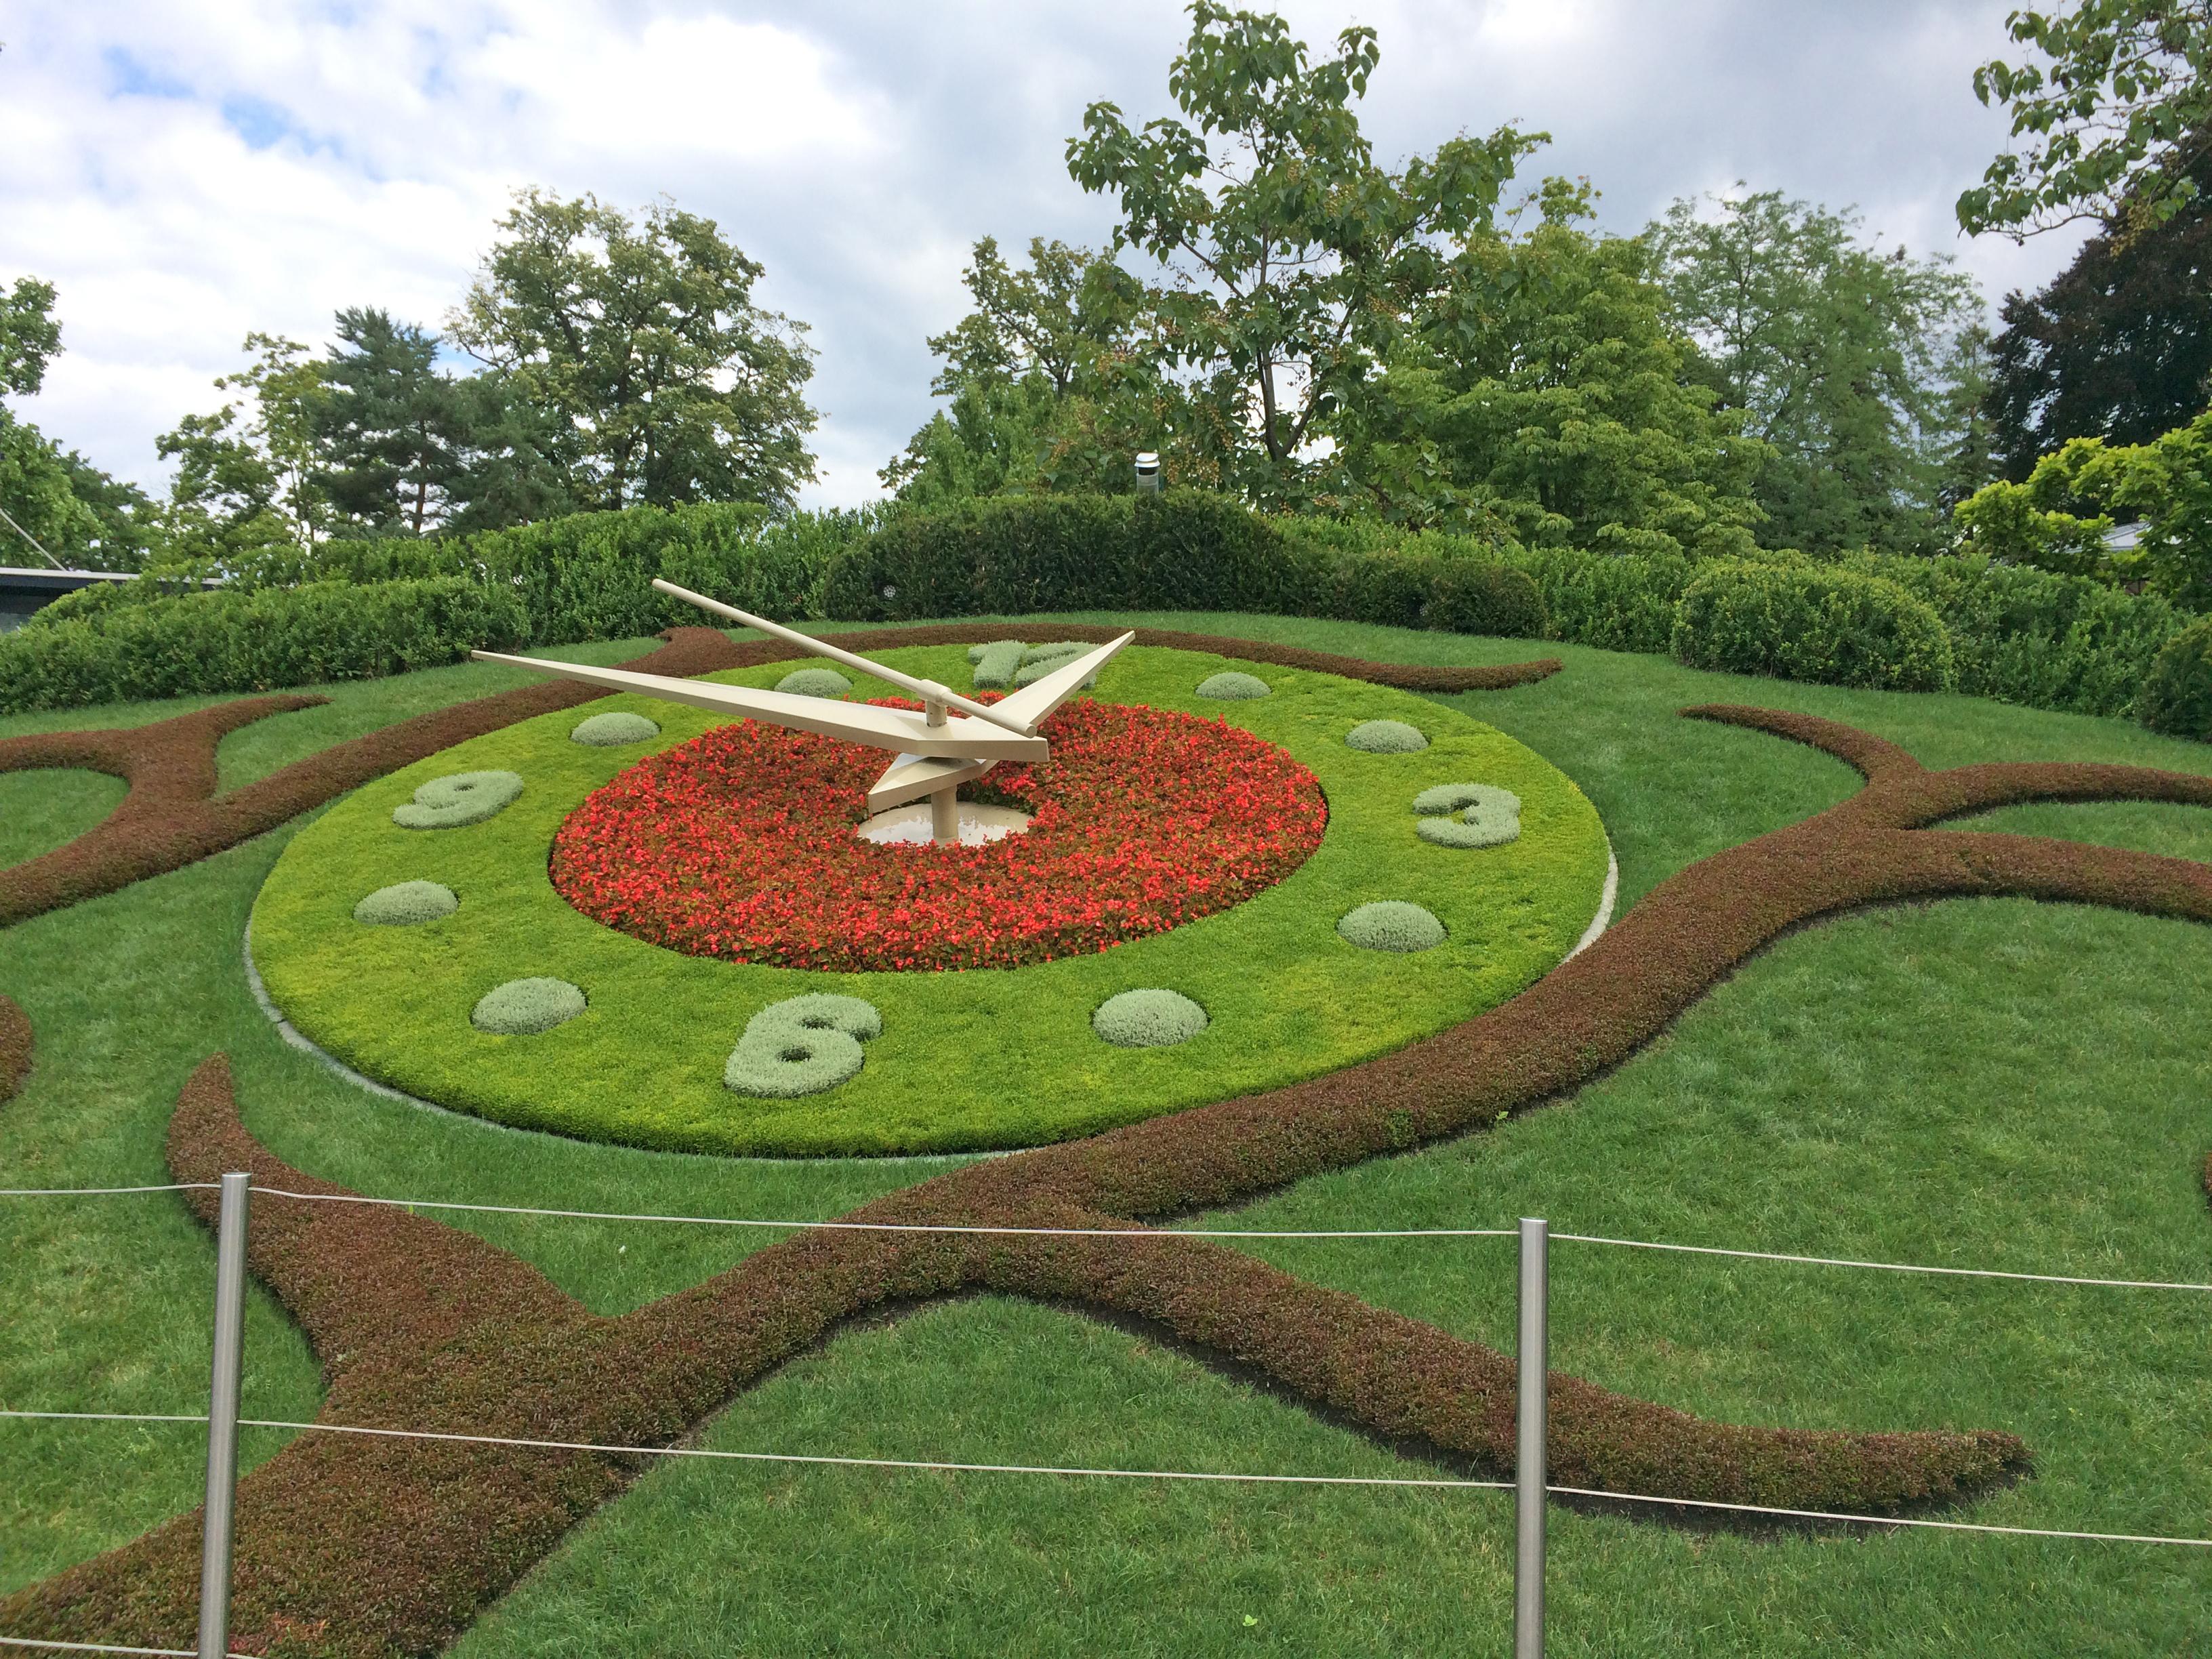 File Blumenglocke Park Jardin Anglais Geneve Schweiz Jpg Wikimedia